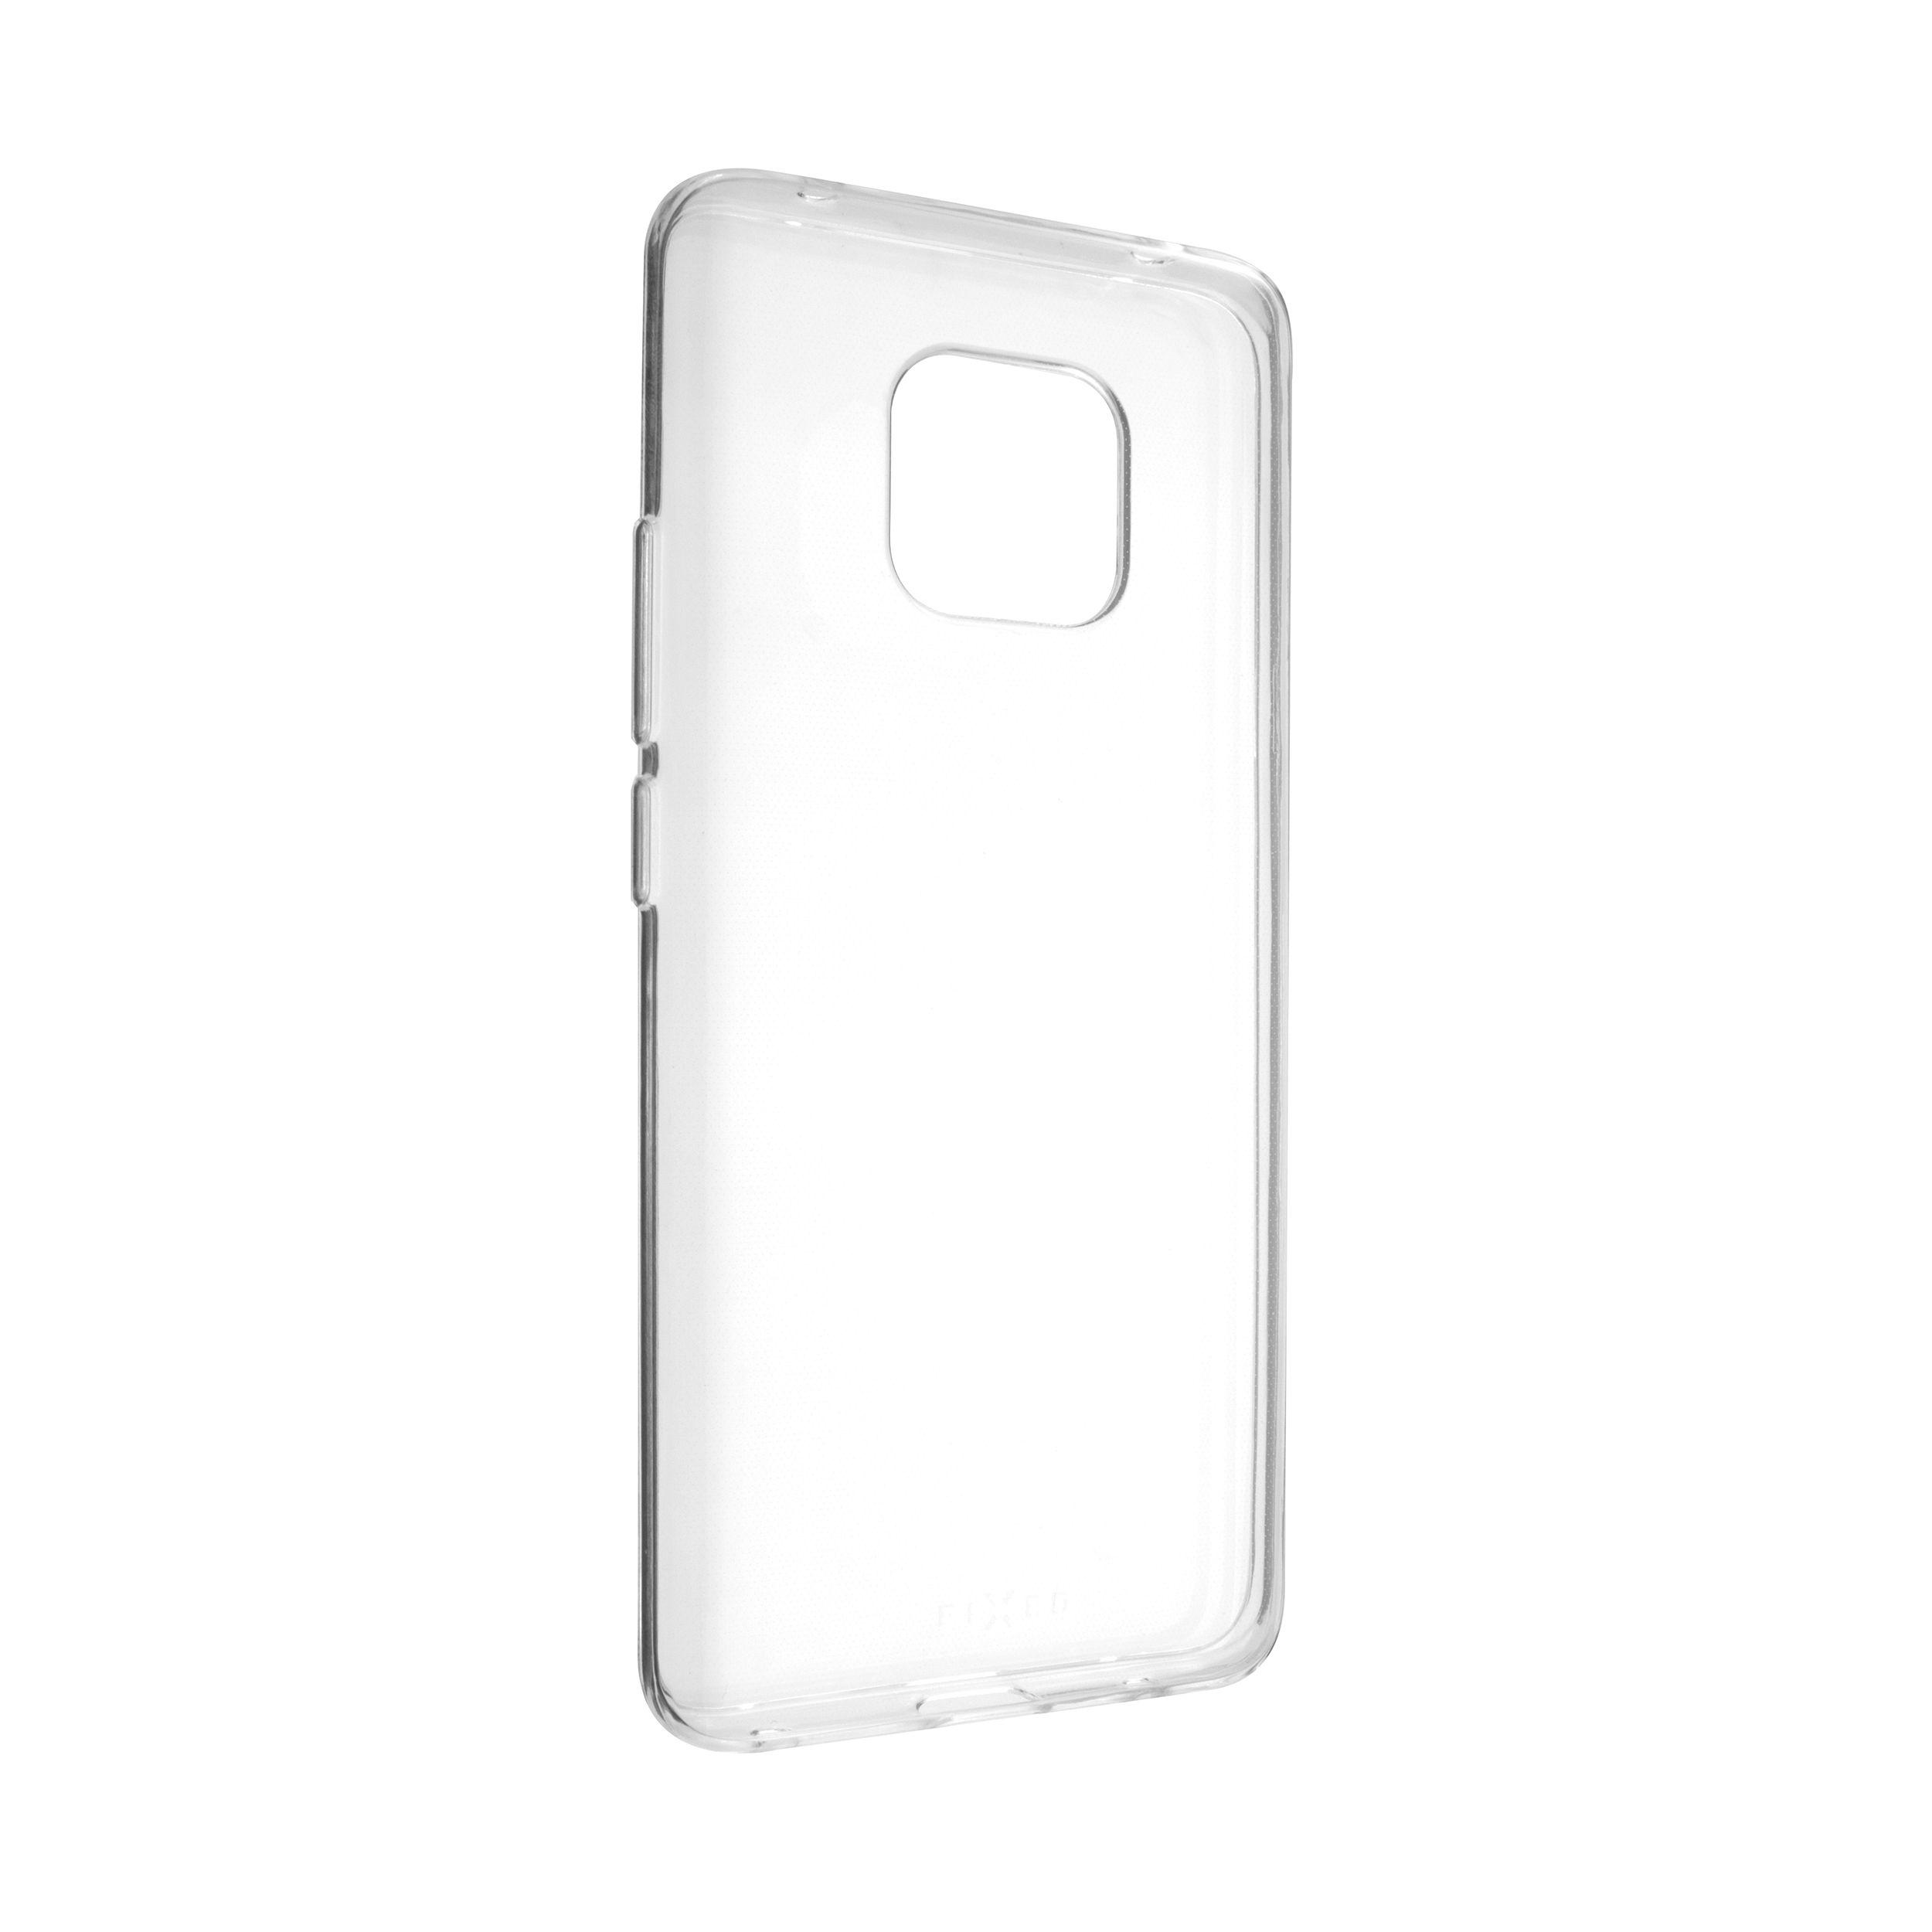 TPU gelové pouzdro FIXED pro Huawei Mate 20 Pro, čiré